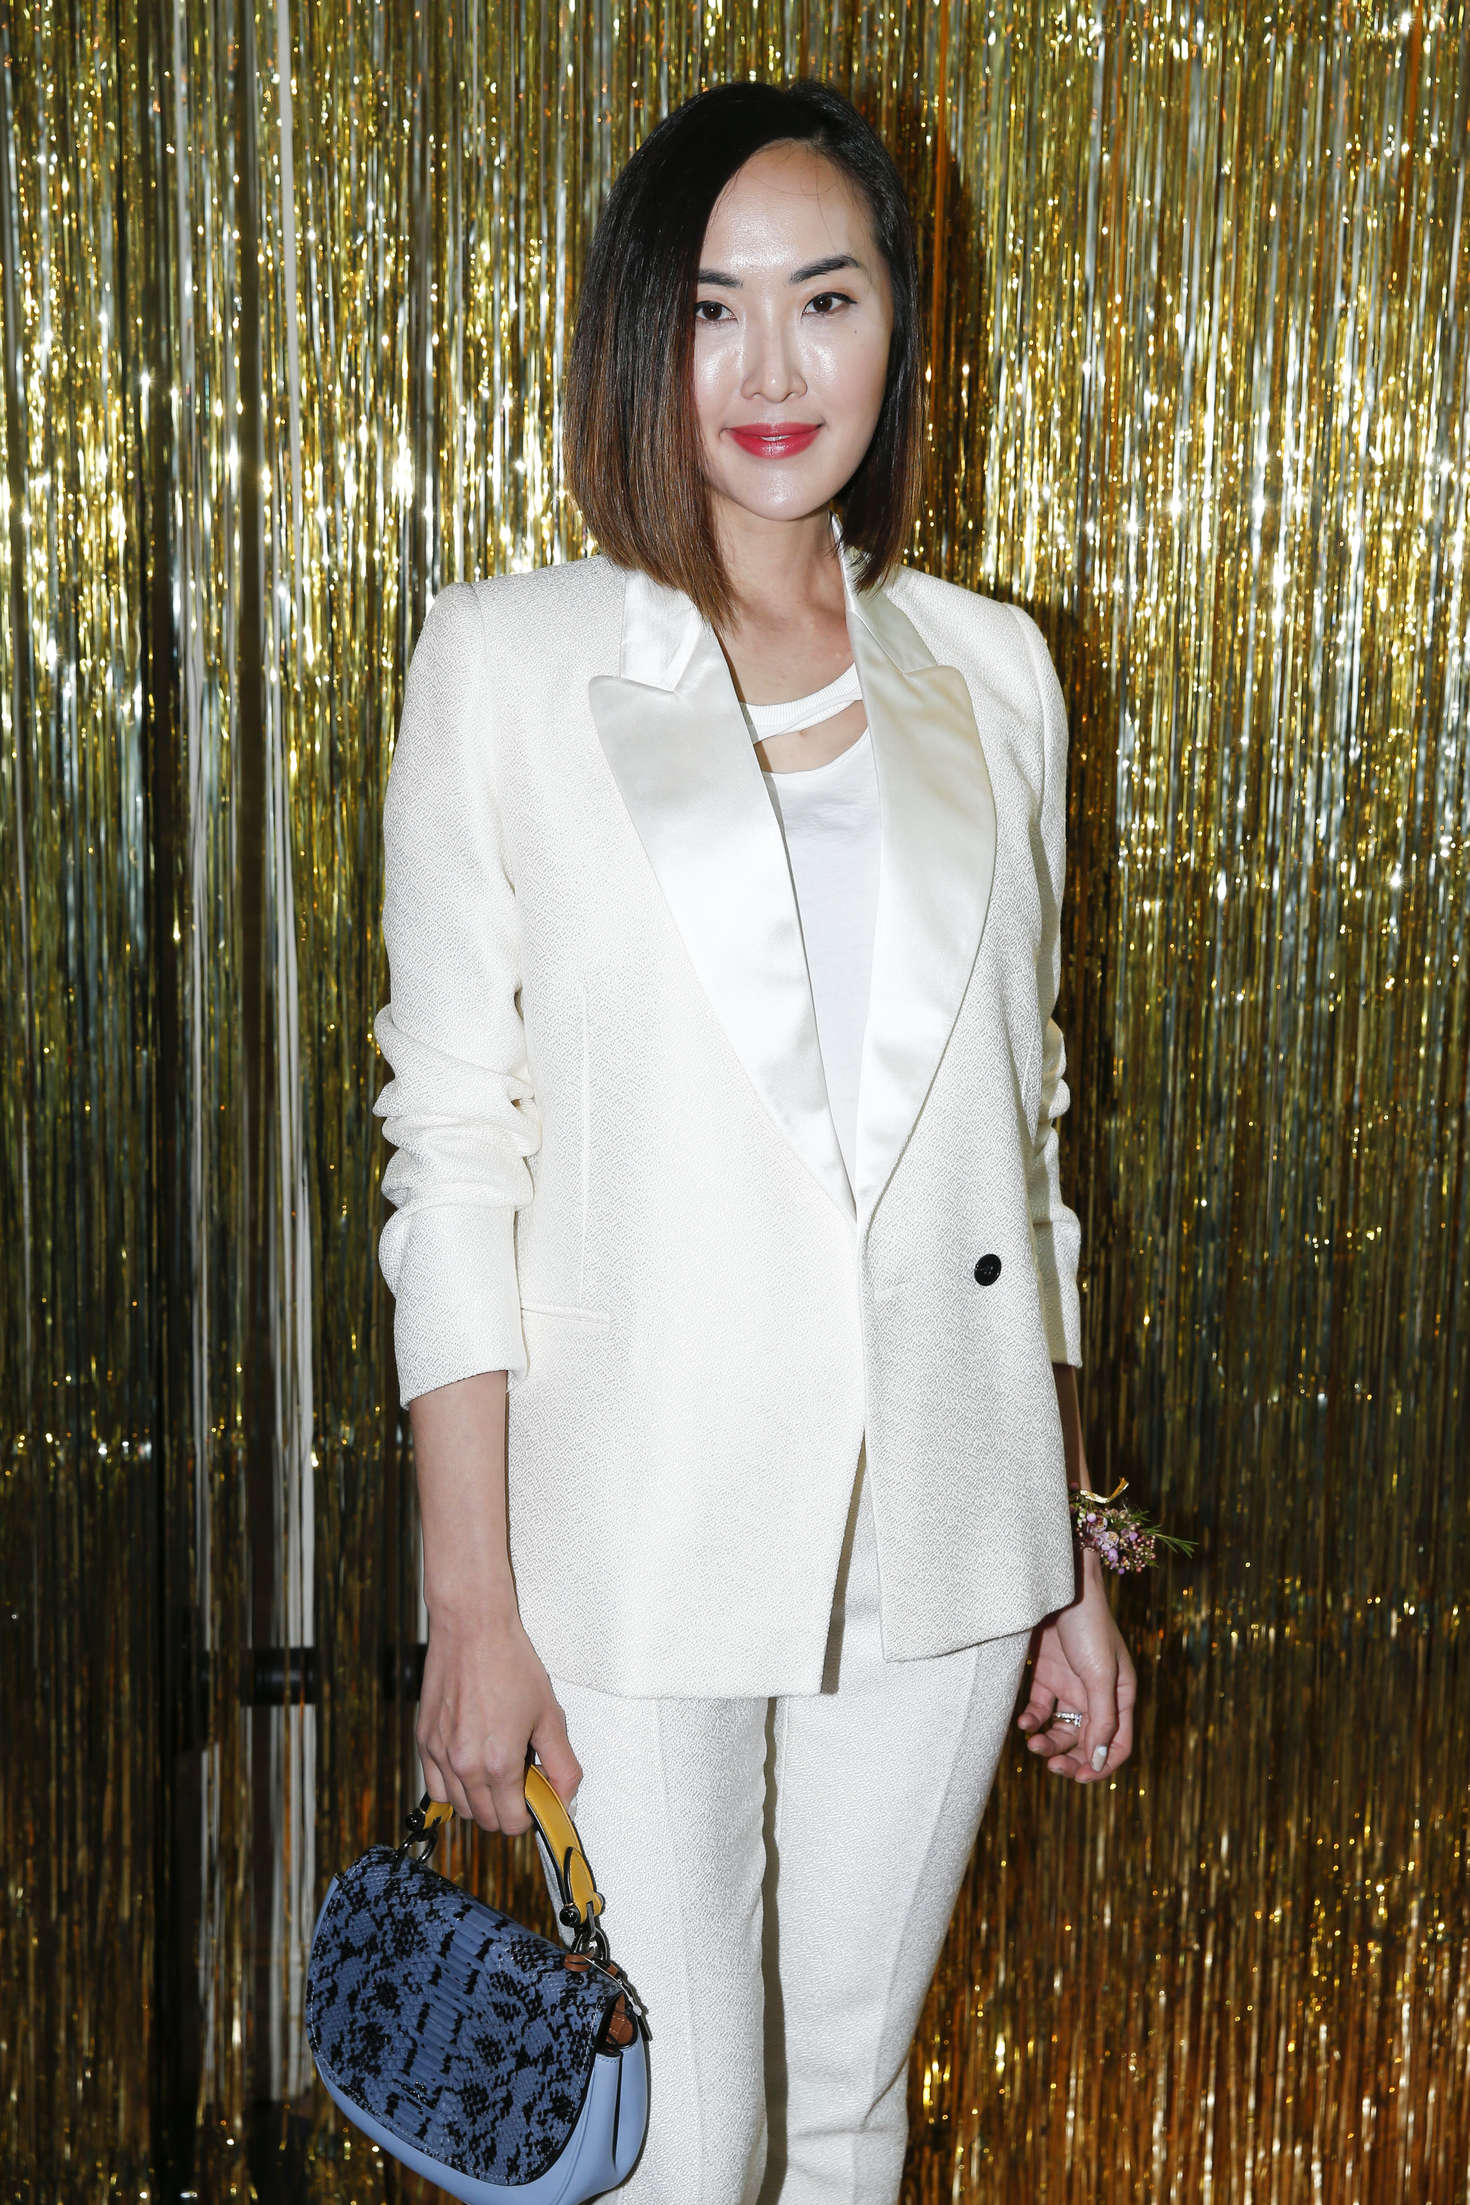 Crystal Lim - Coach Party 2016 in Paris